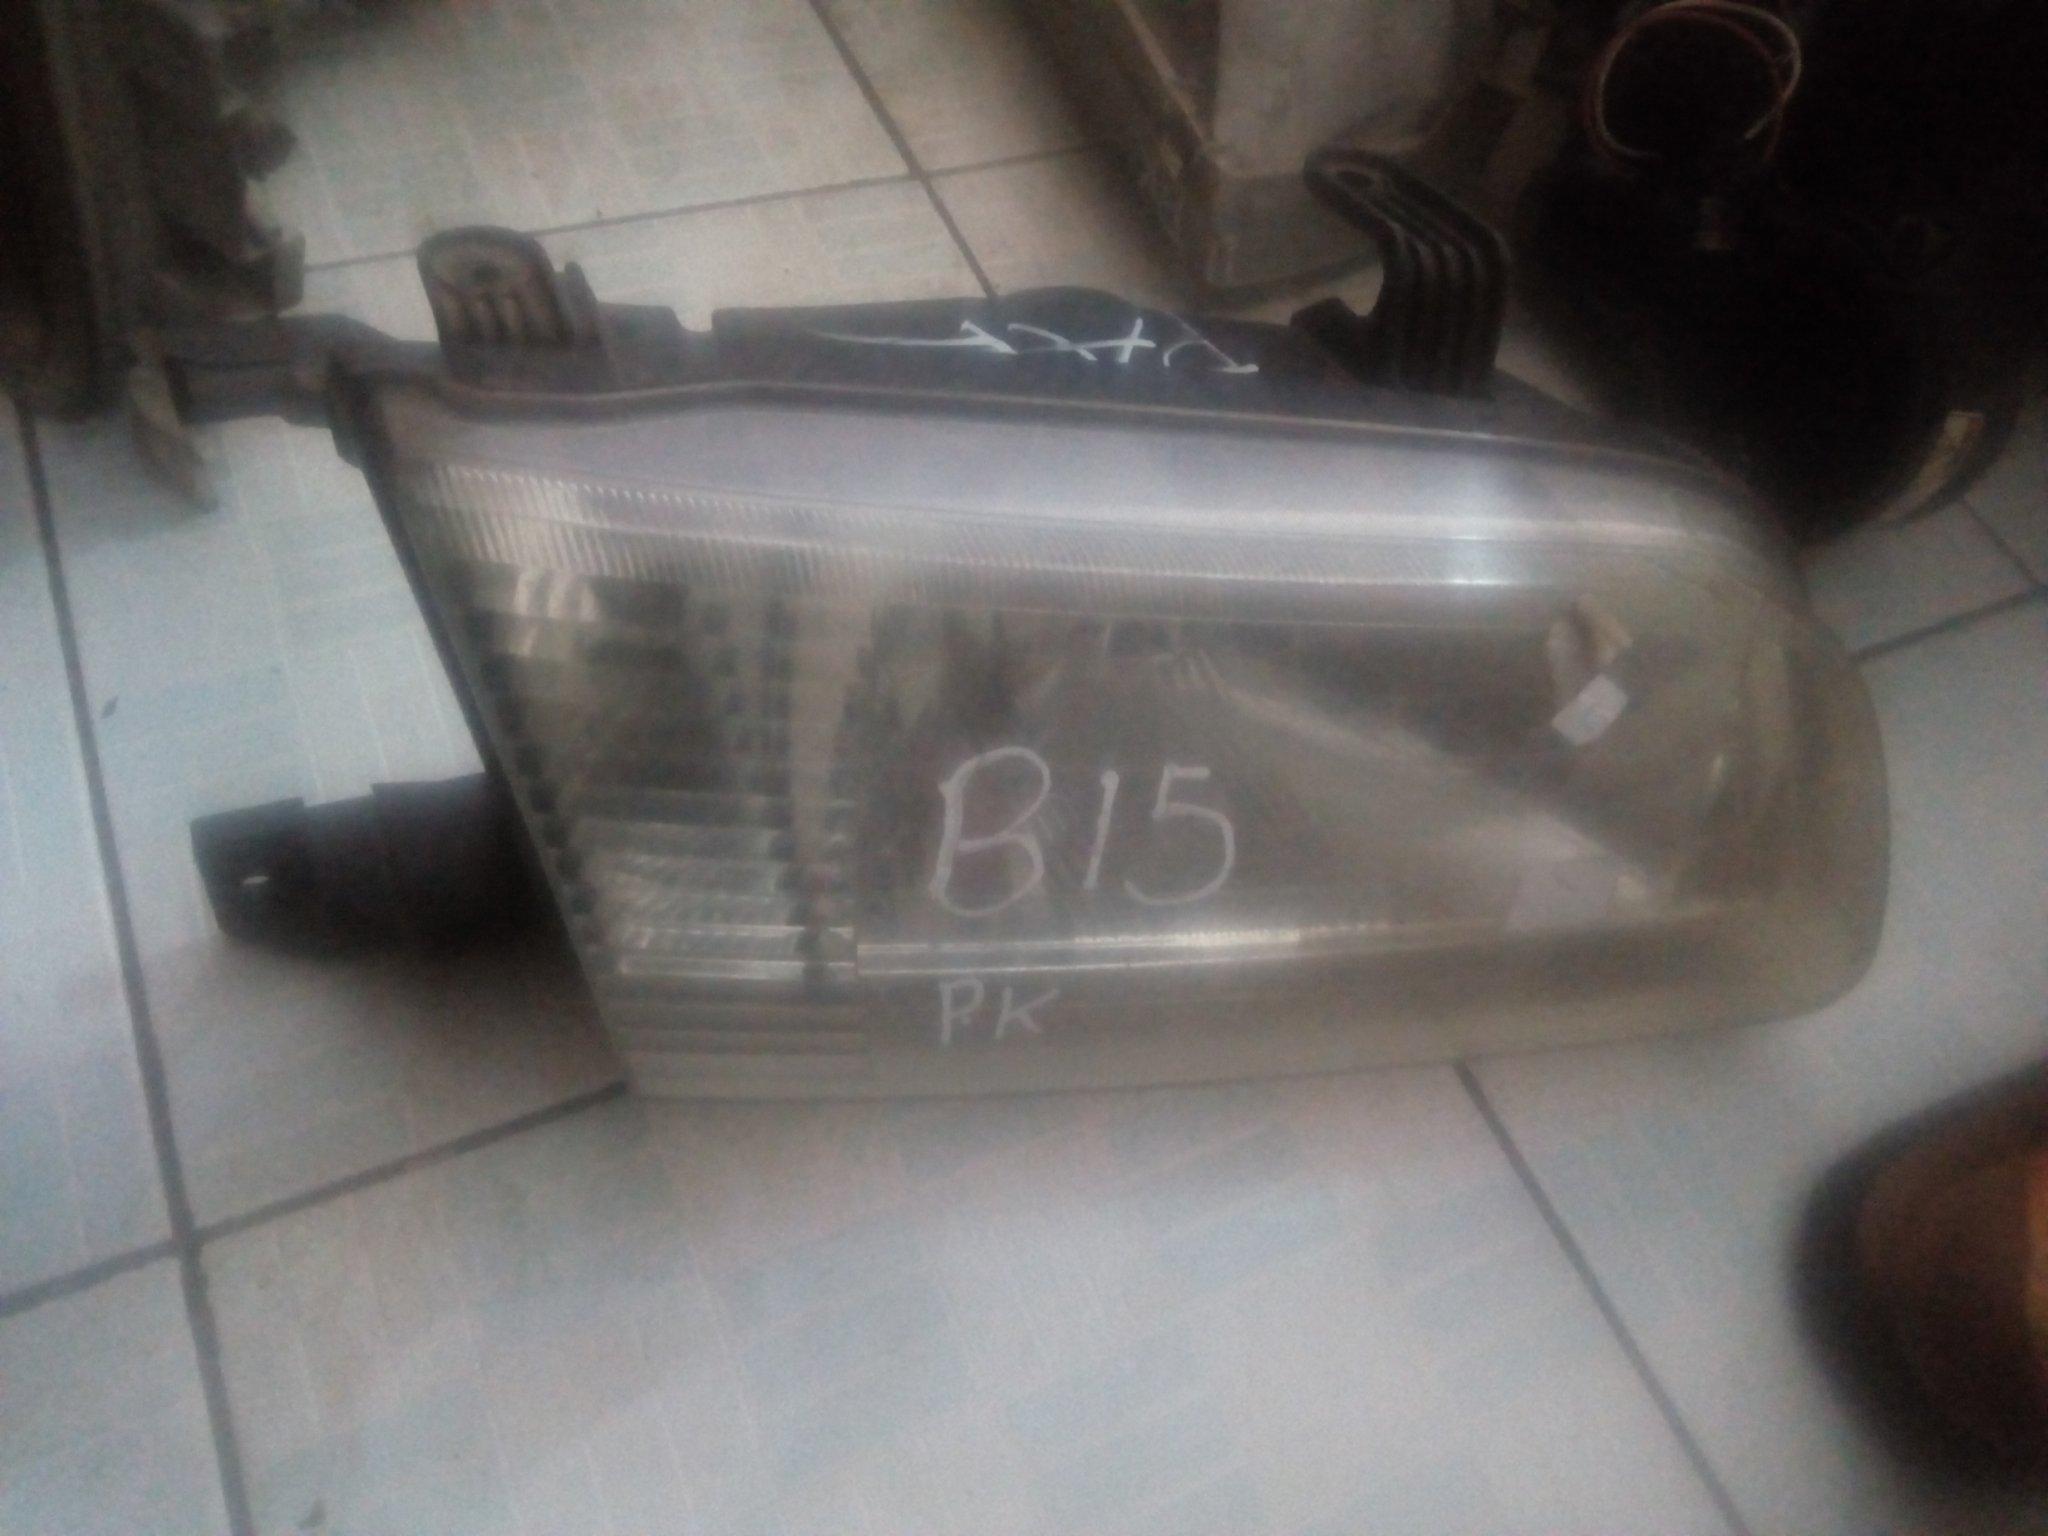 Nissan B15 headlight 00590